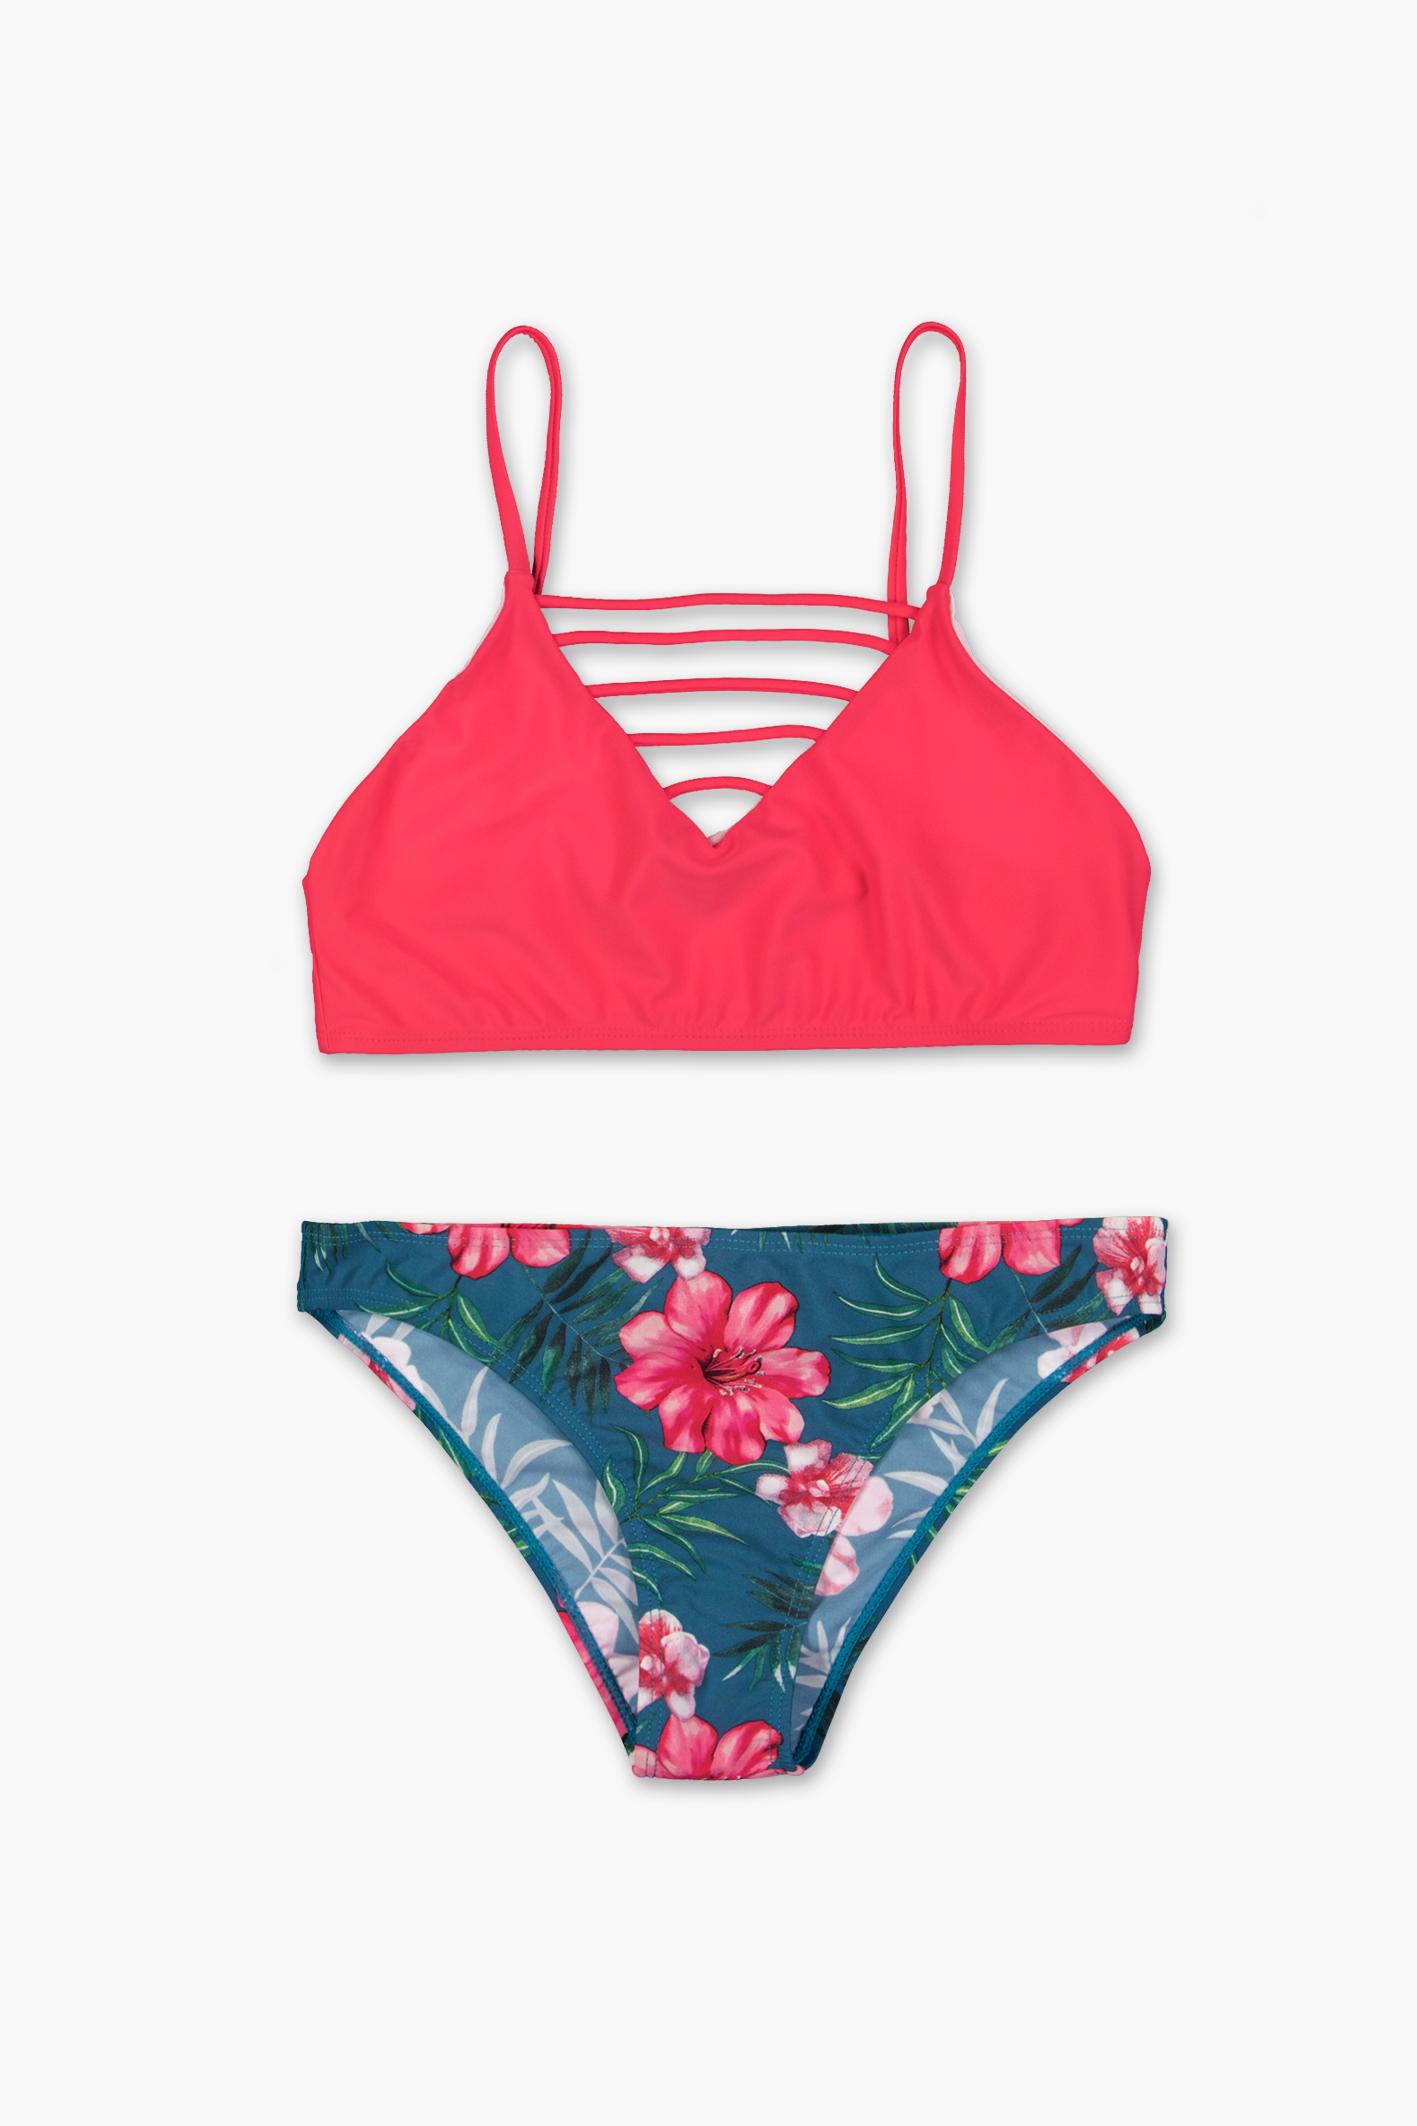 comoquieres_bikini-stp-juana-0-3_27-27-2020__picture-12027